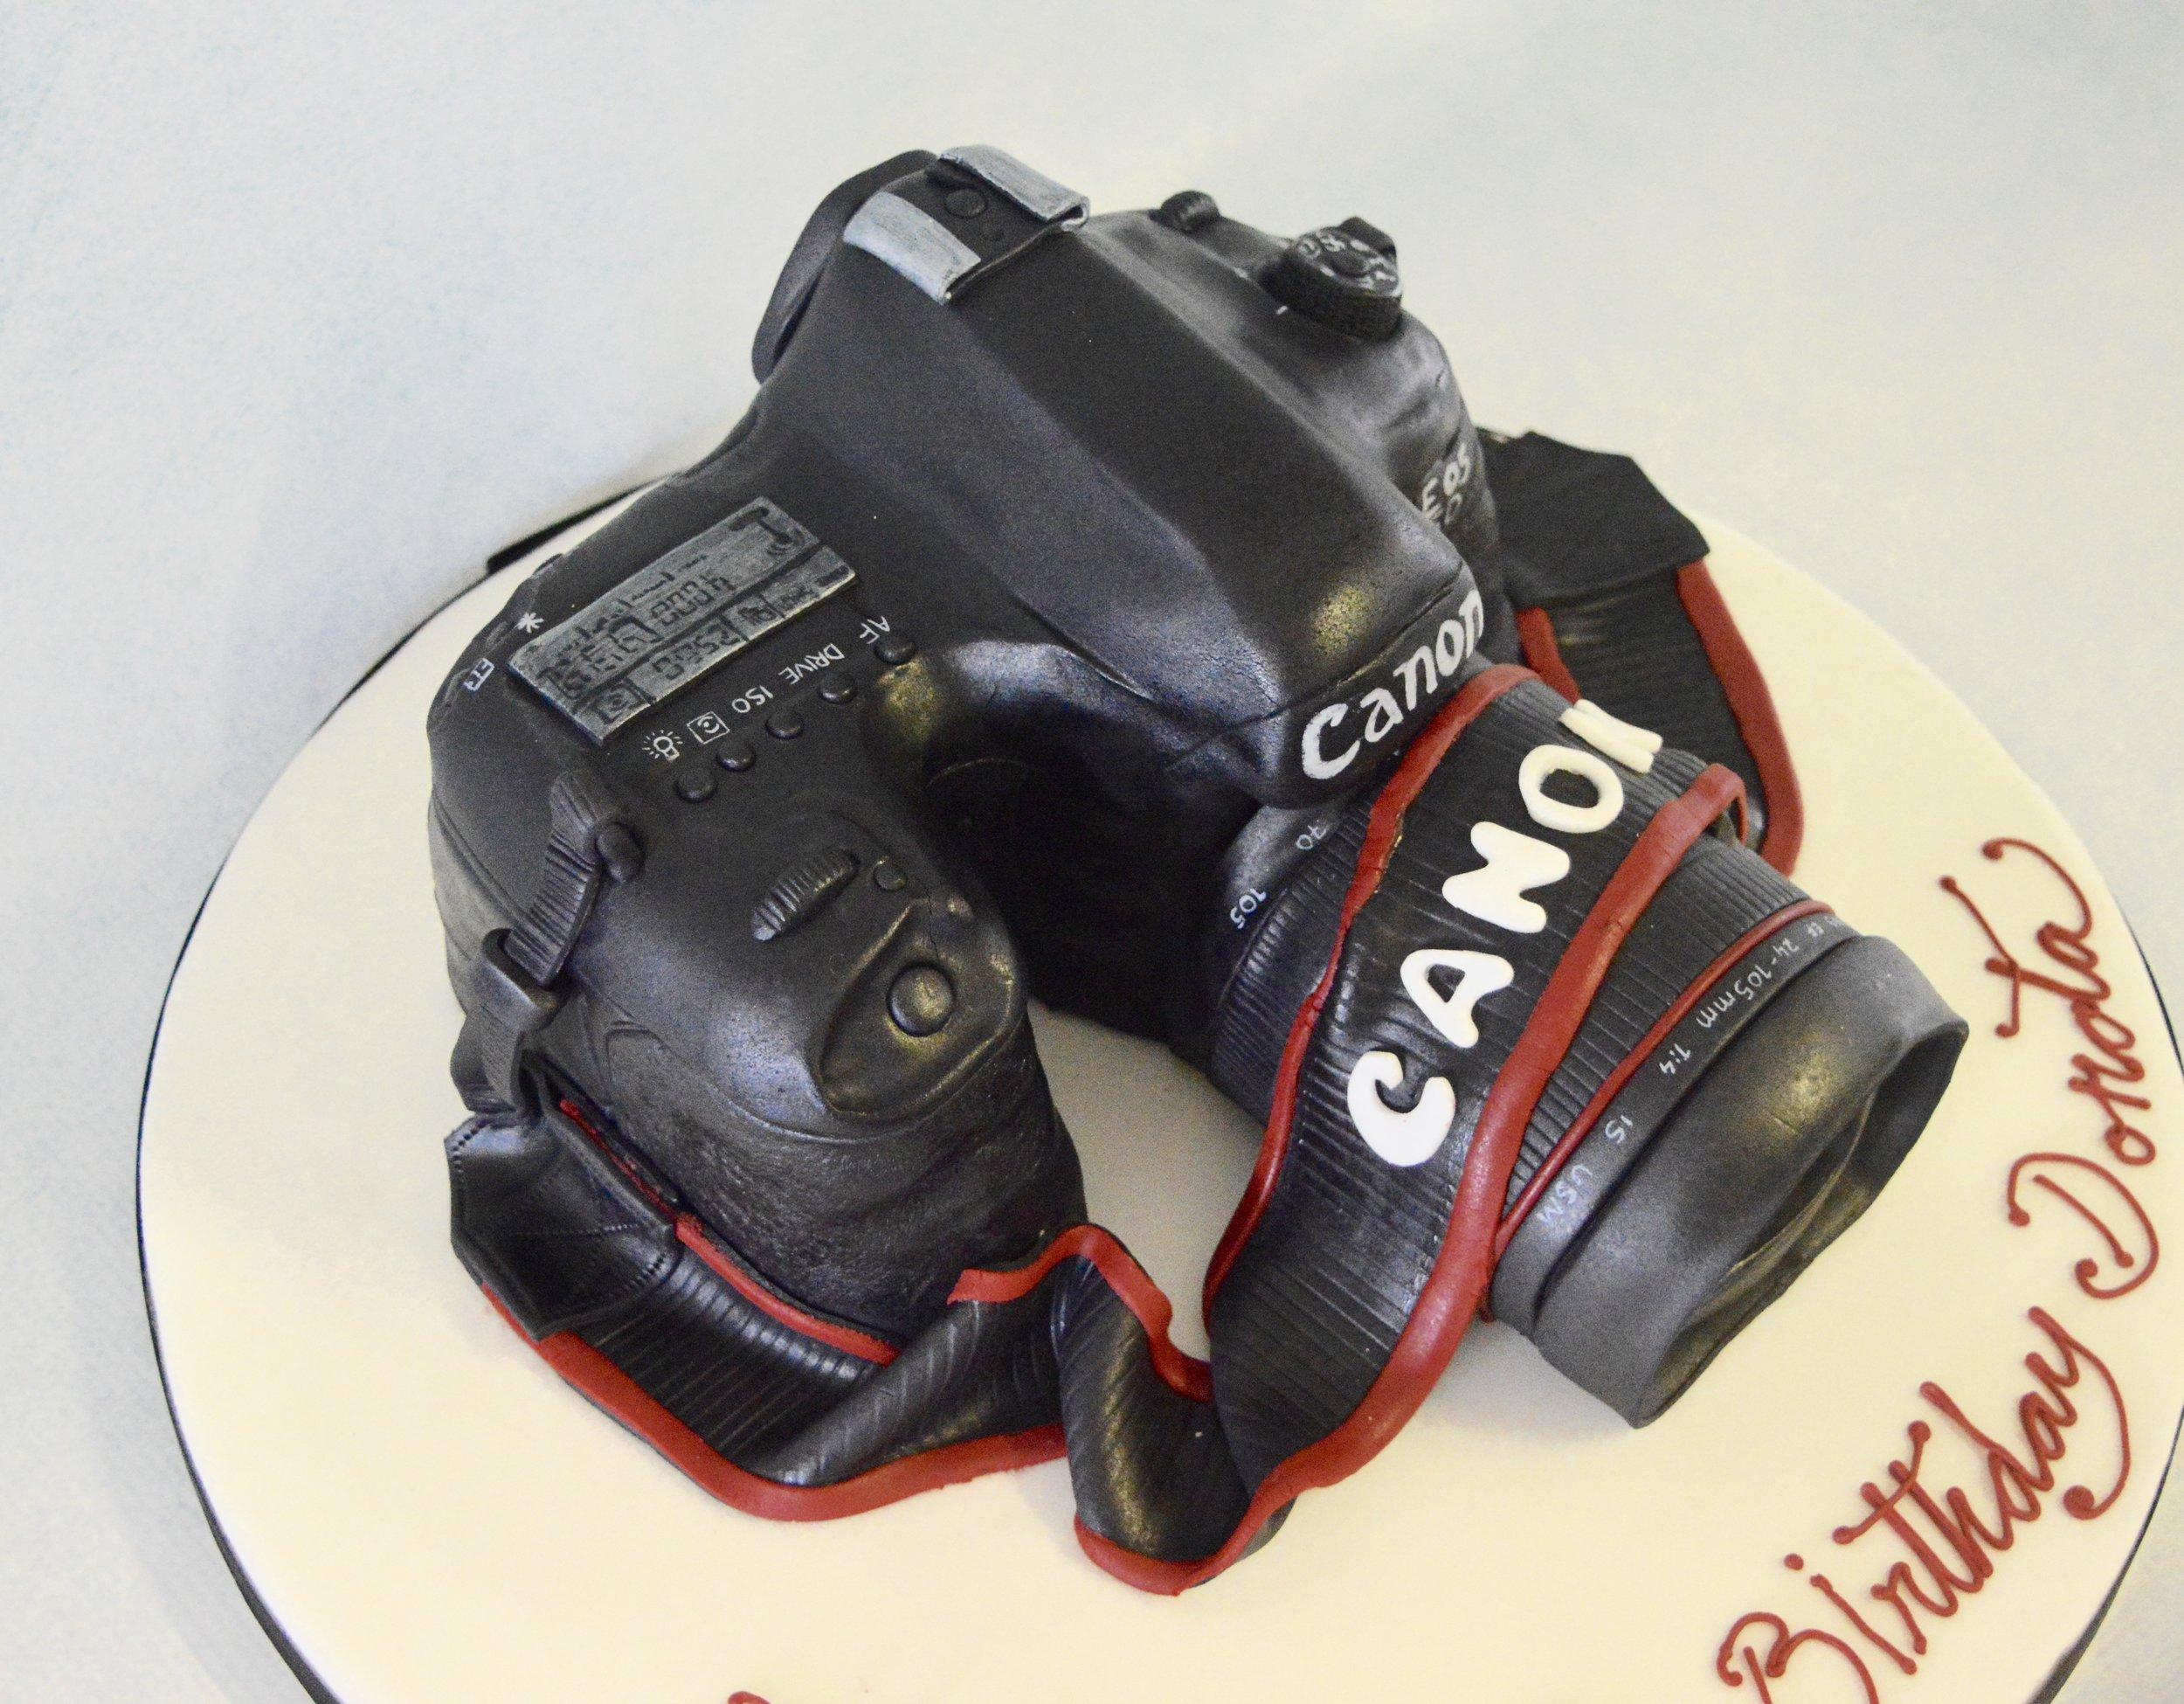 Sculptured cake london, birthday cake, wedding cake, custom cake, bespoke cake, london cake,